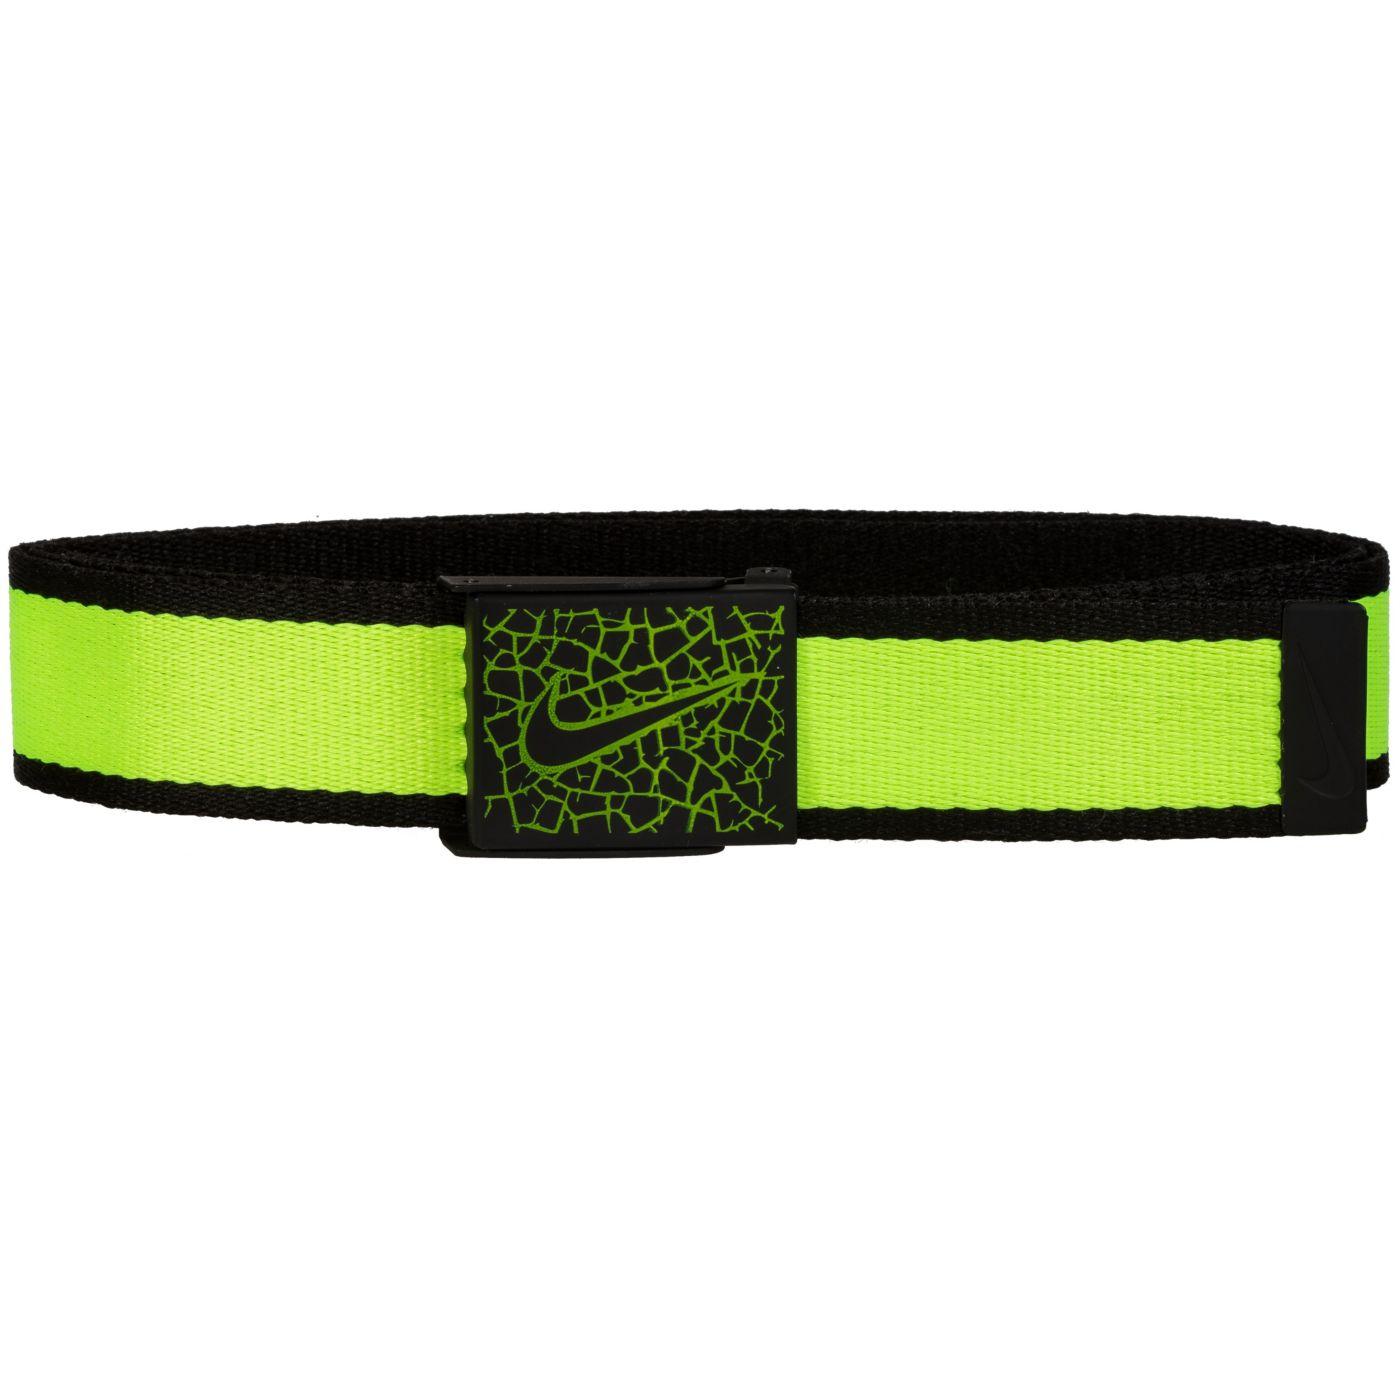 Nike Men's Crackle Buckle Reversible Golf Belt